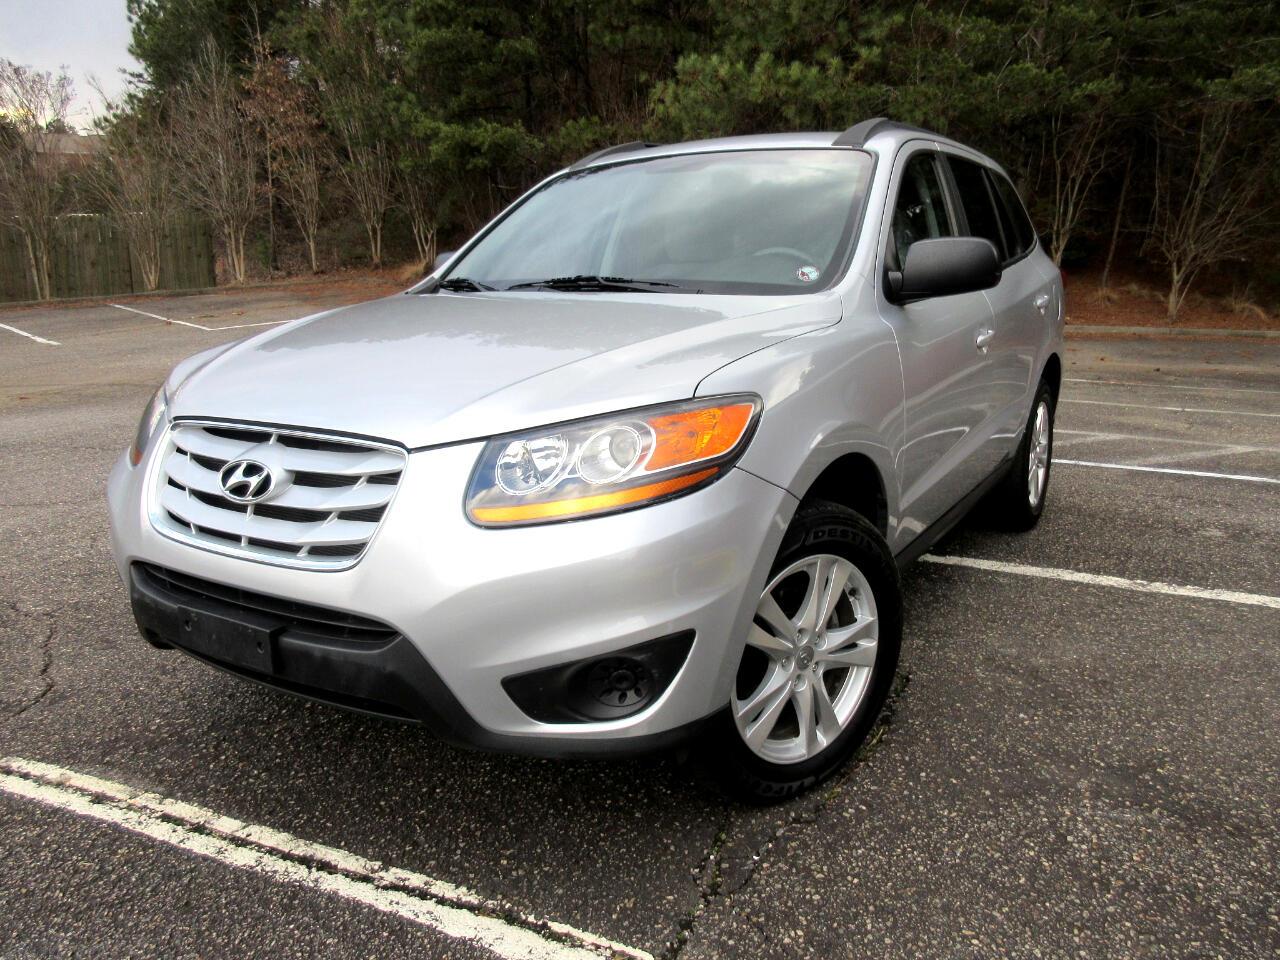 Hyundai Santa Fe GLS 2.4 FWD 2010